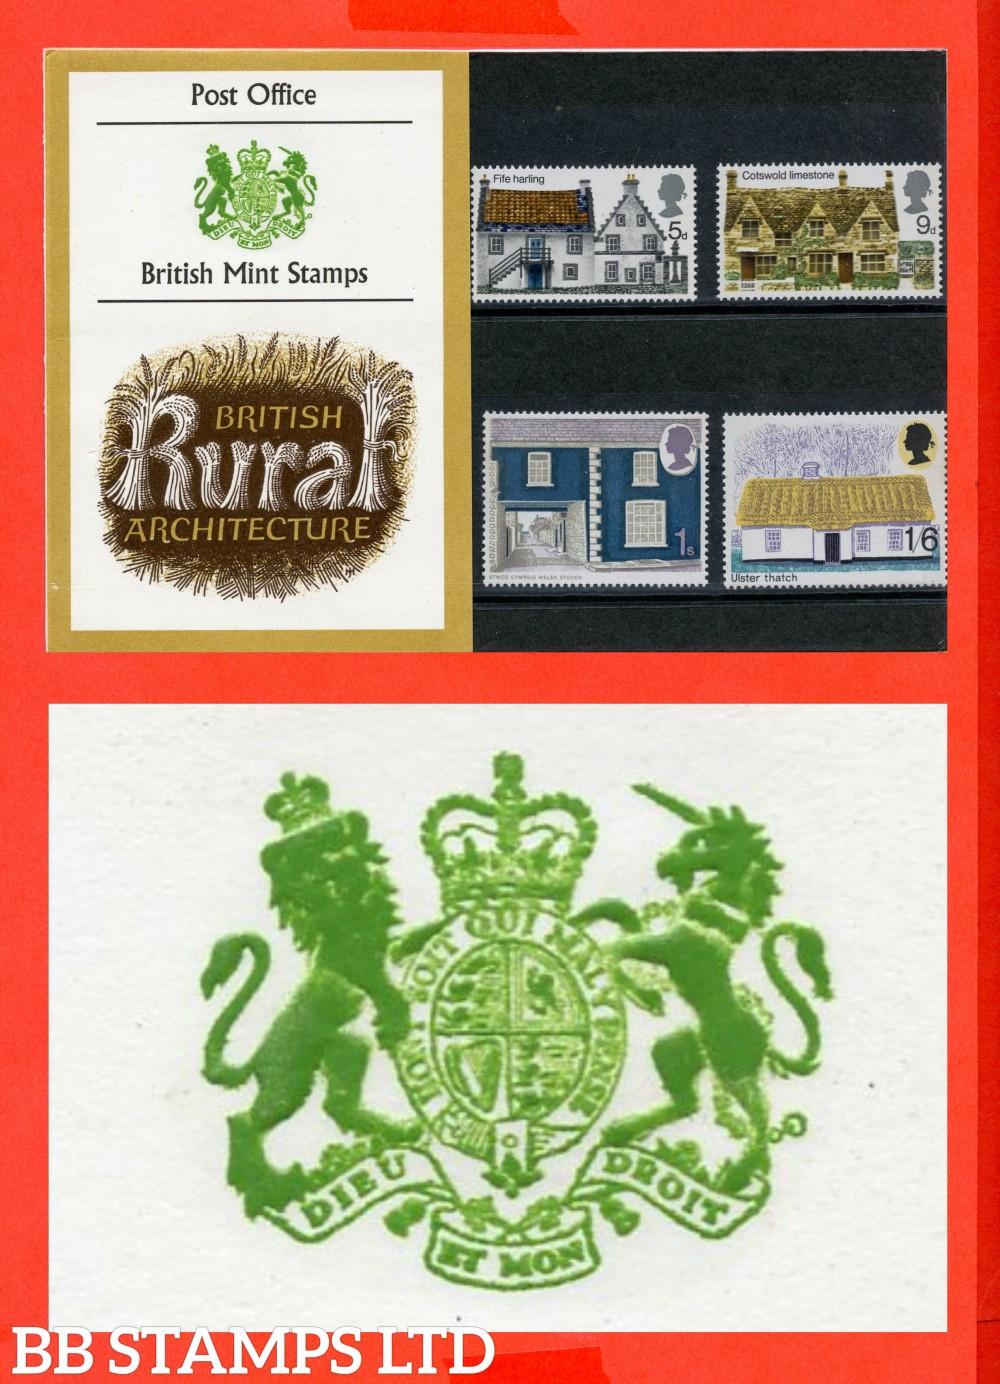 1970 British Rural Presentation Pack Type B = Two Tufts On Unicorns Head.